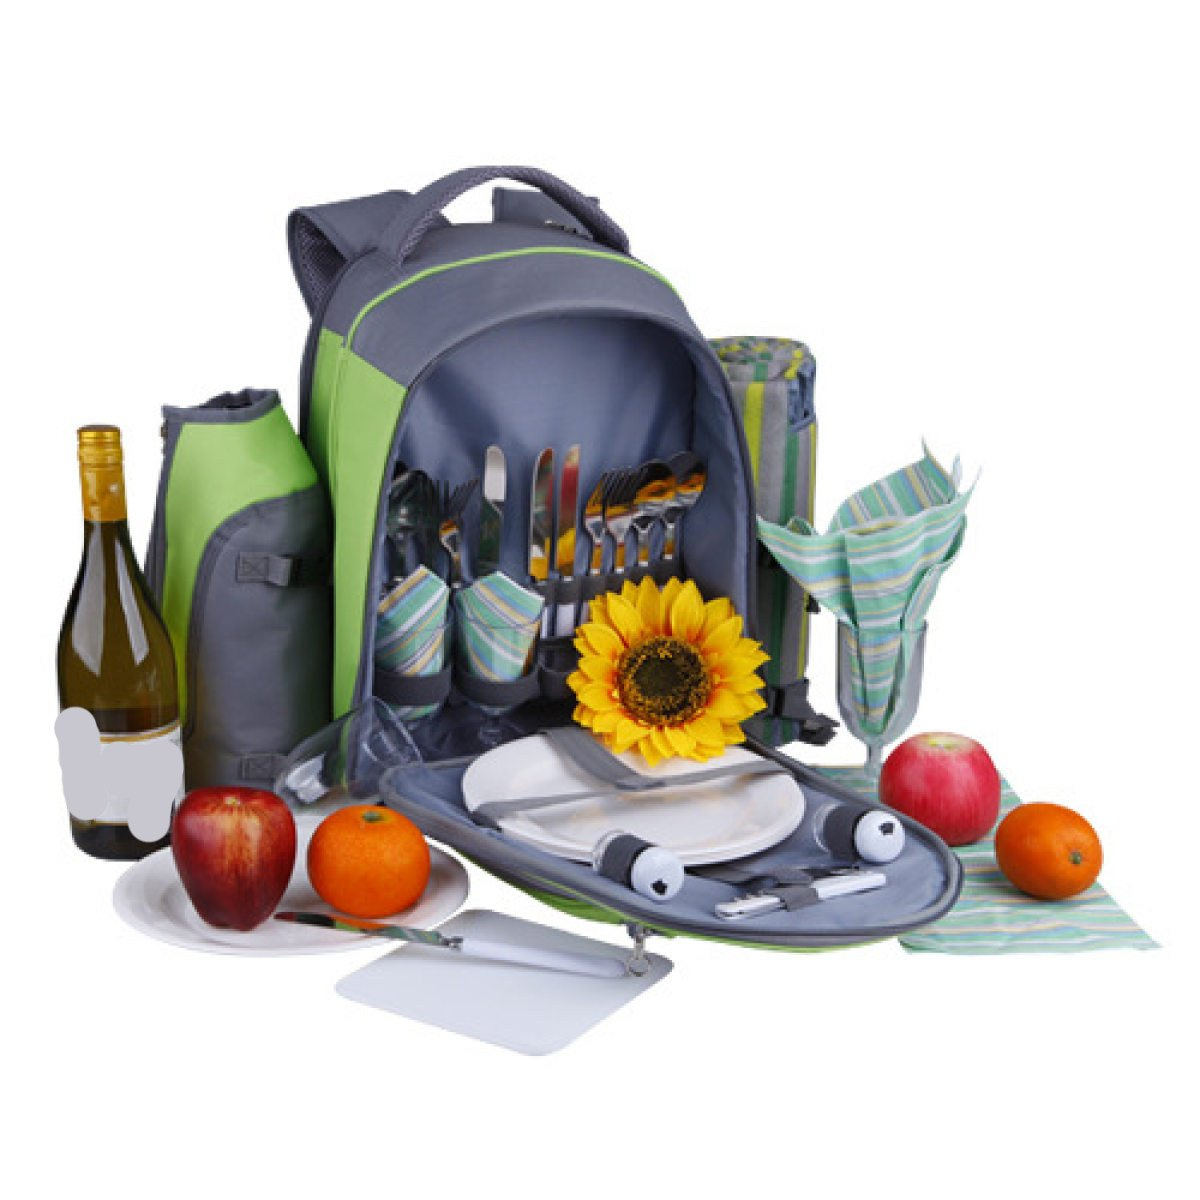 Outdoor-Schultertasche Camping Picknick-Taschen Geschirr Massennahrungsmittelbeutel Tragbarer Rucksack